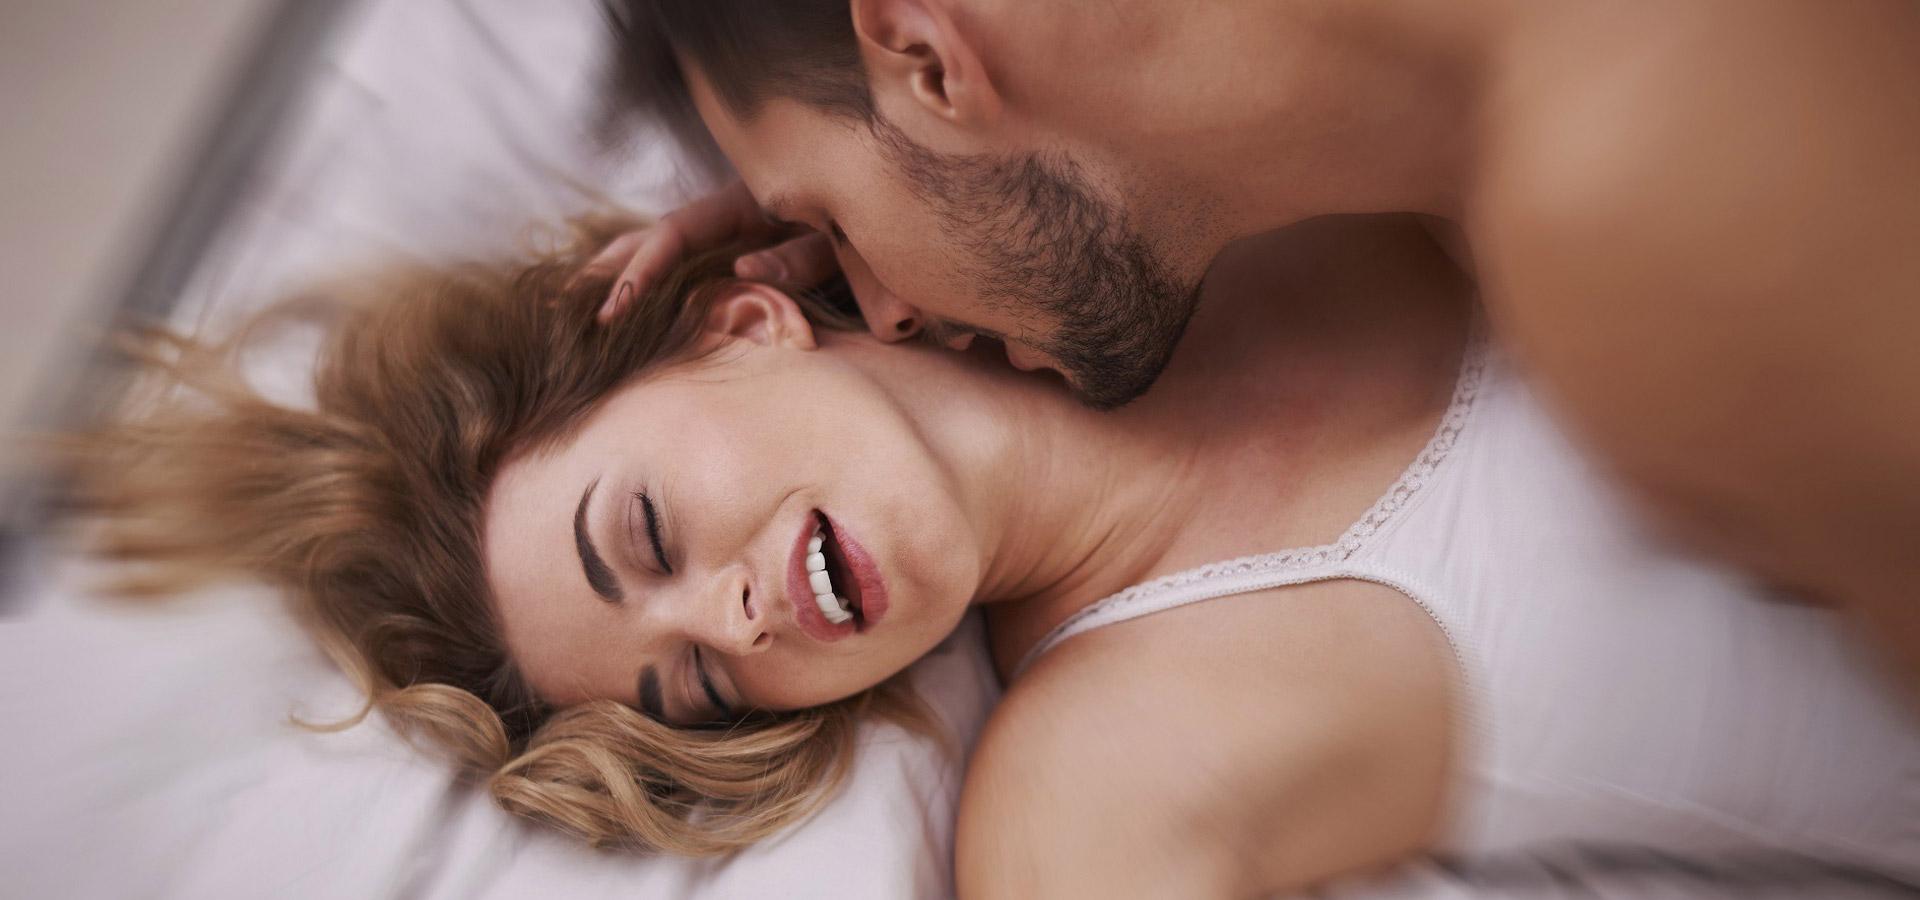 http://www.sexualite-et-contraception